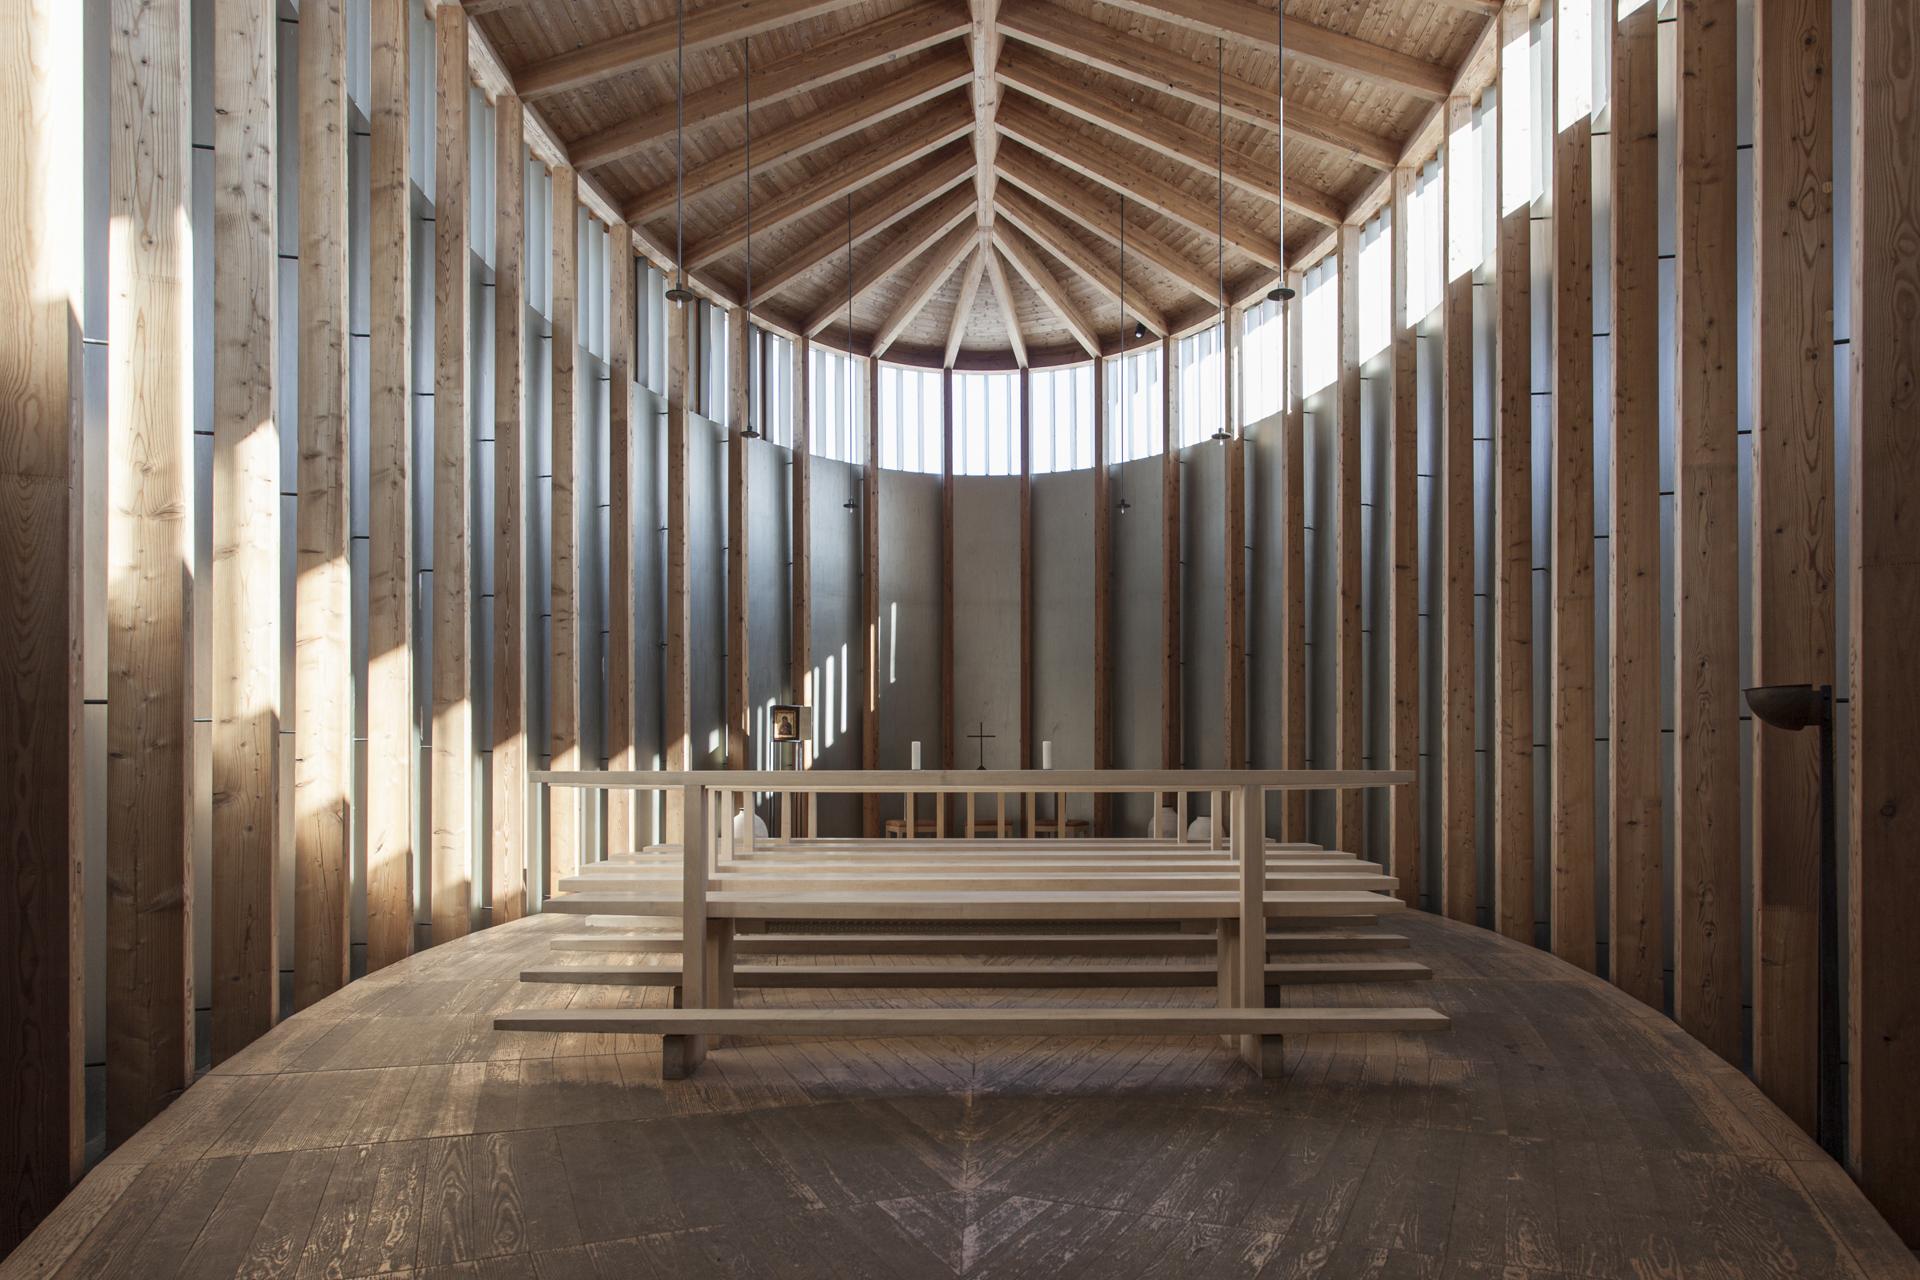 Saint Benedict Chapel / Peter Zumthor, Foto Alberto Canepa - www.albertocanepa.com